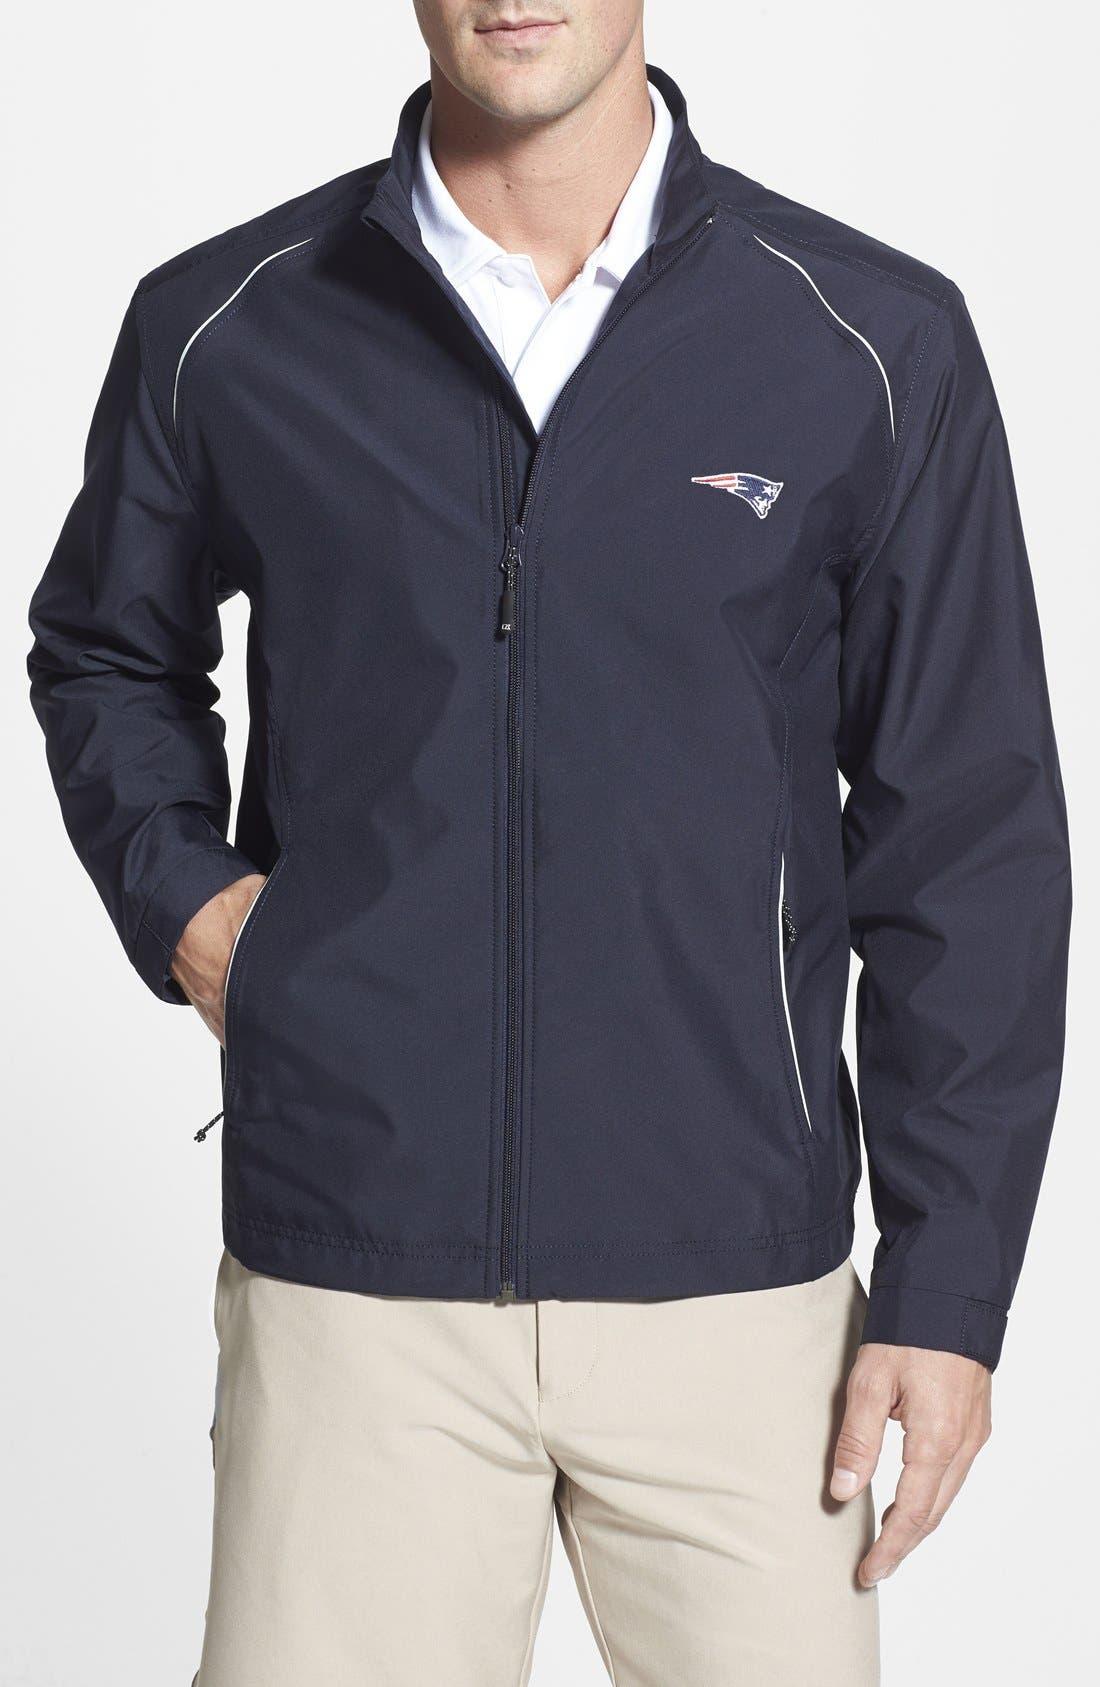 Alternate Image 1 Selected - Cutter & Buck New England Patriots - Beacon WeatherTec Wind & Water Resistant Jacket